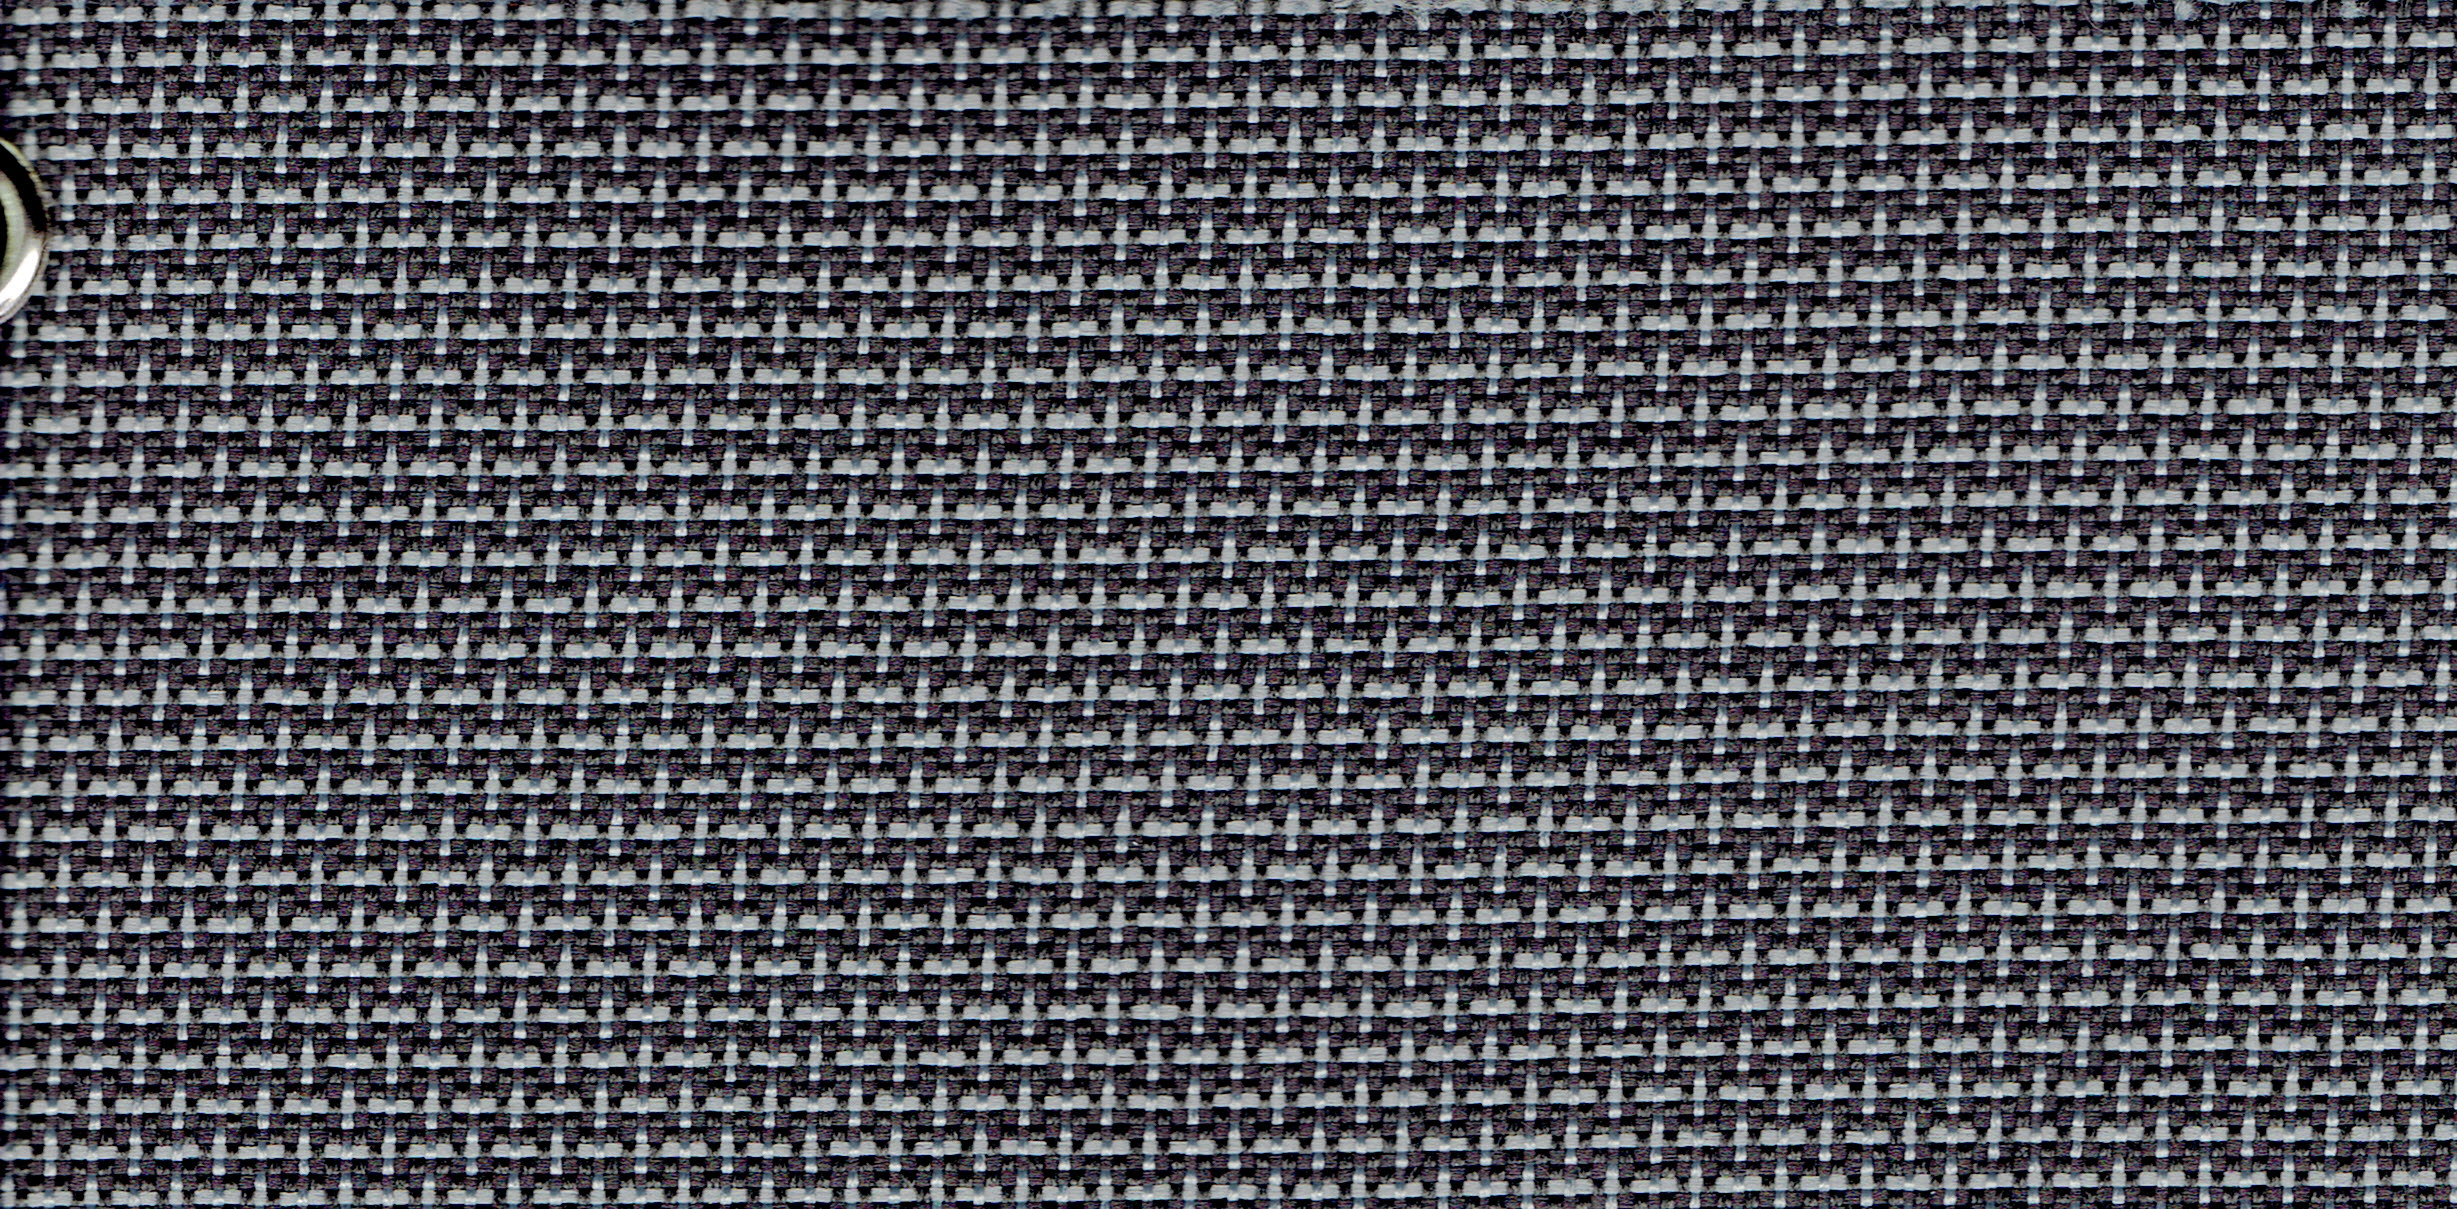 fabric26082015_0022.jpg